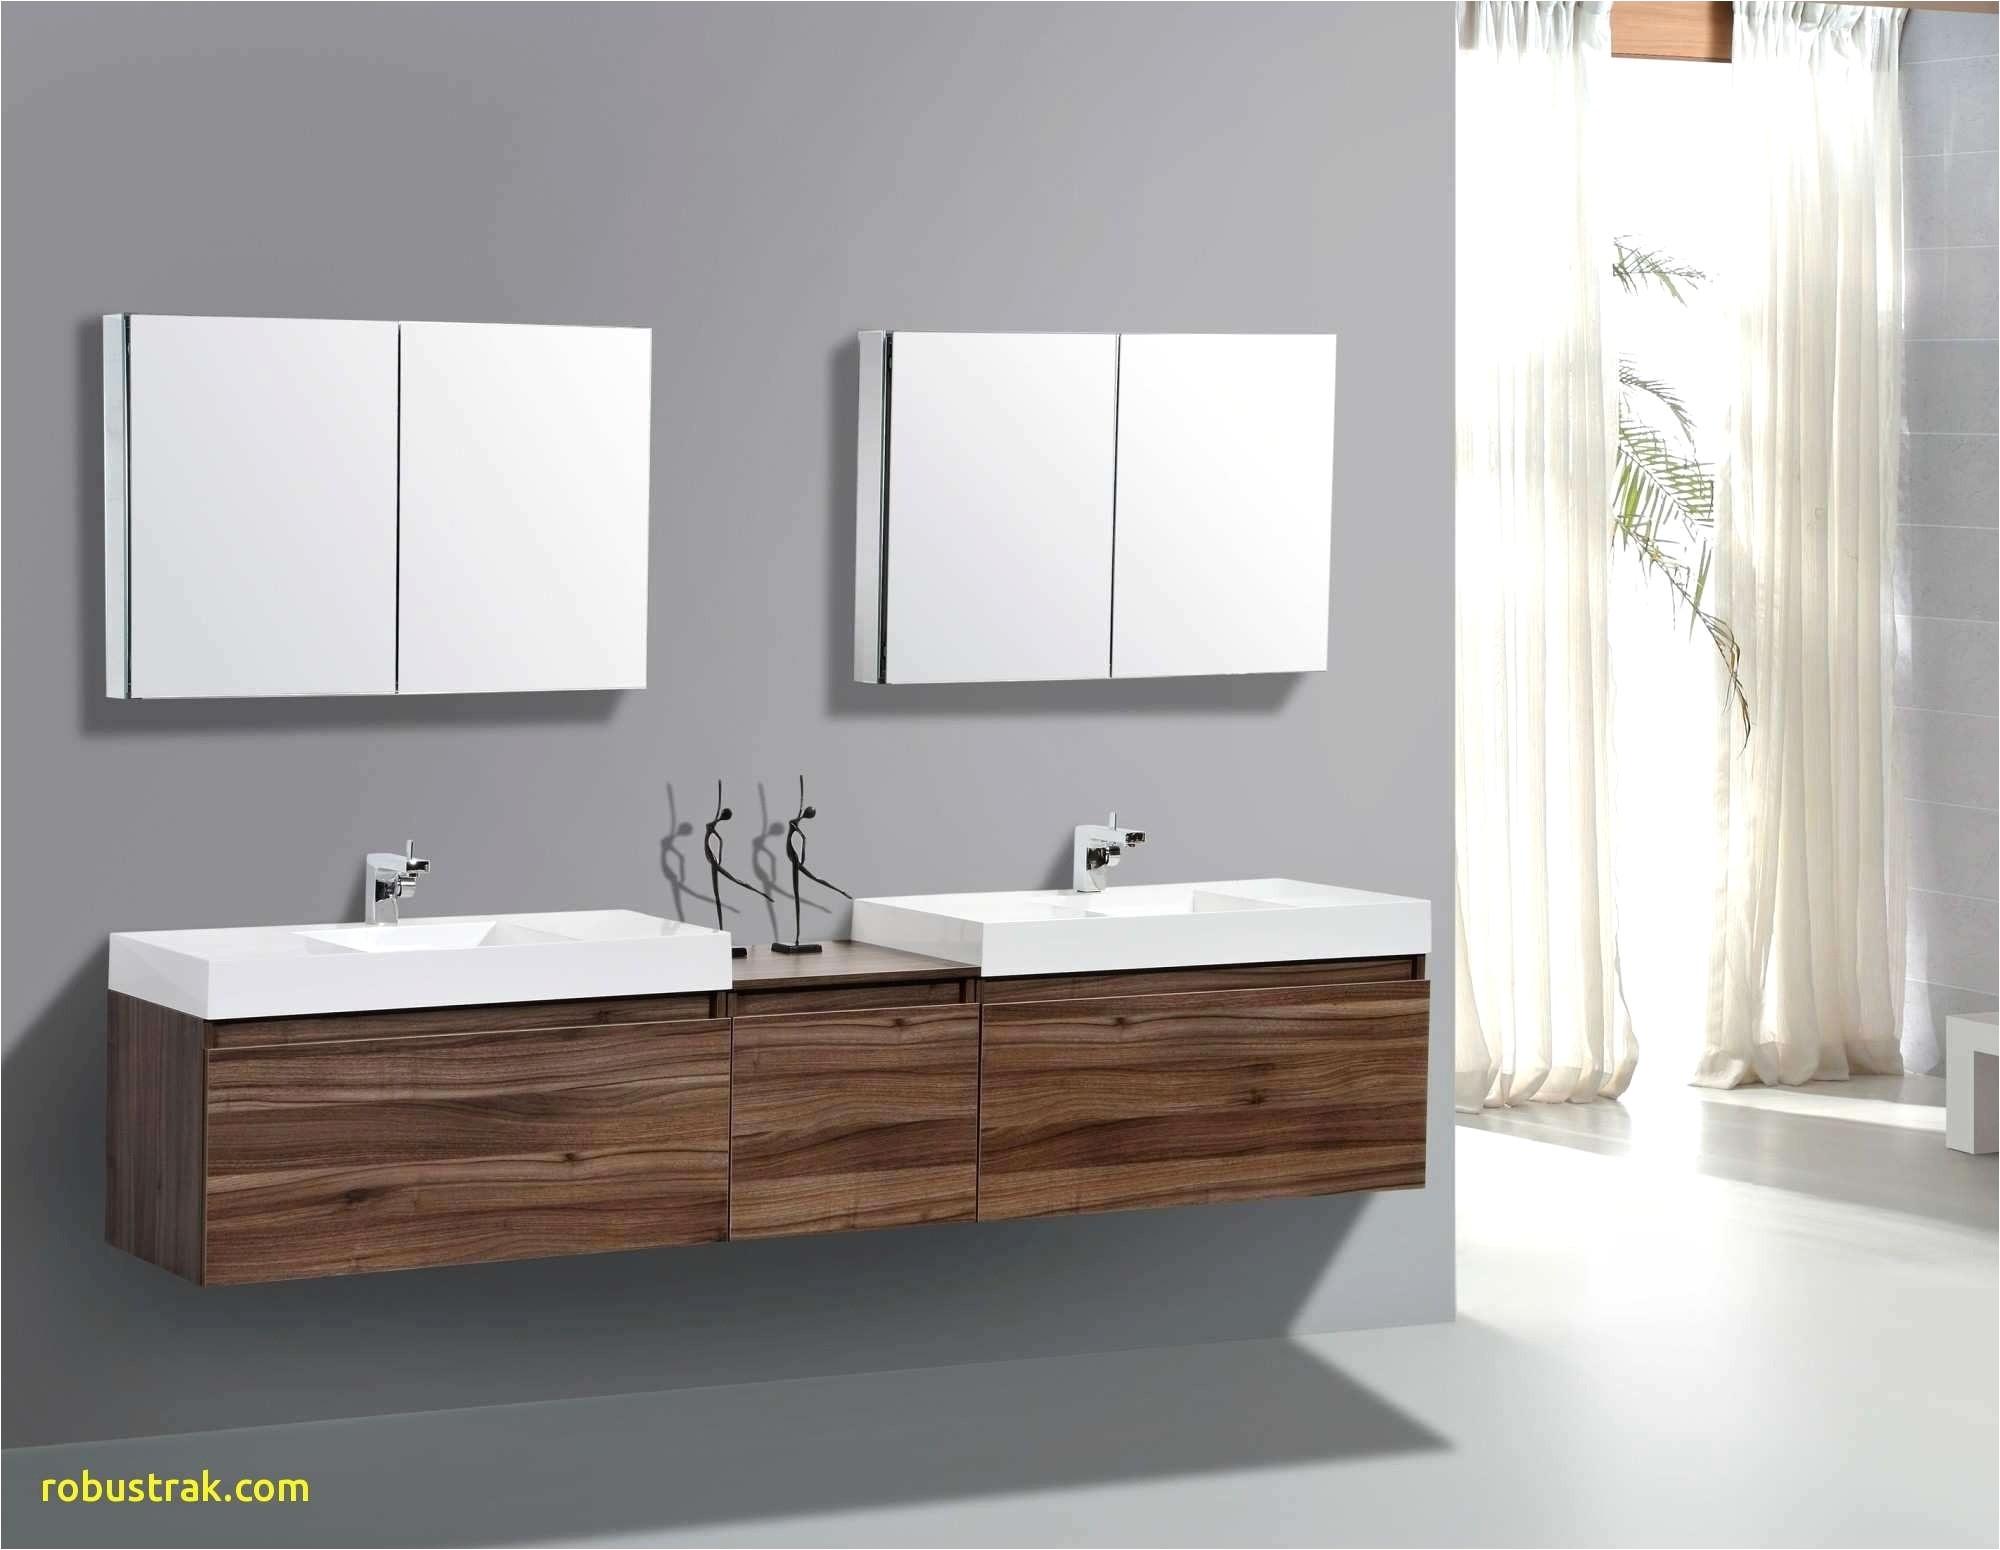 Bathtubs for Trailers Bathtub Lowes Beautiful Corner Bath Tubs Inspirational toilets Lowes